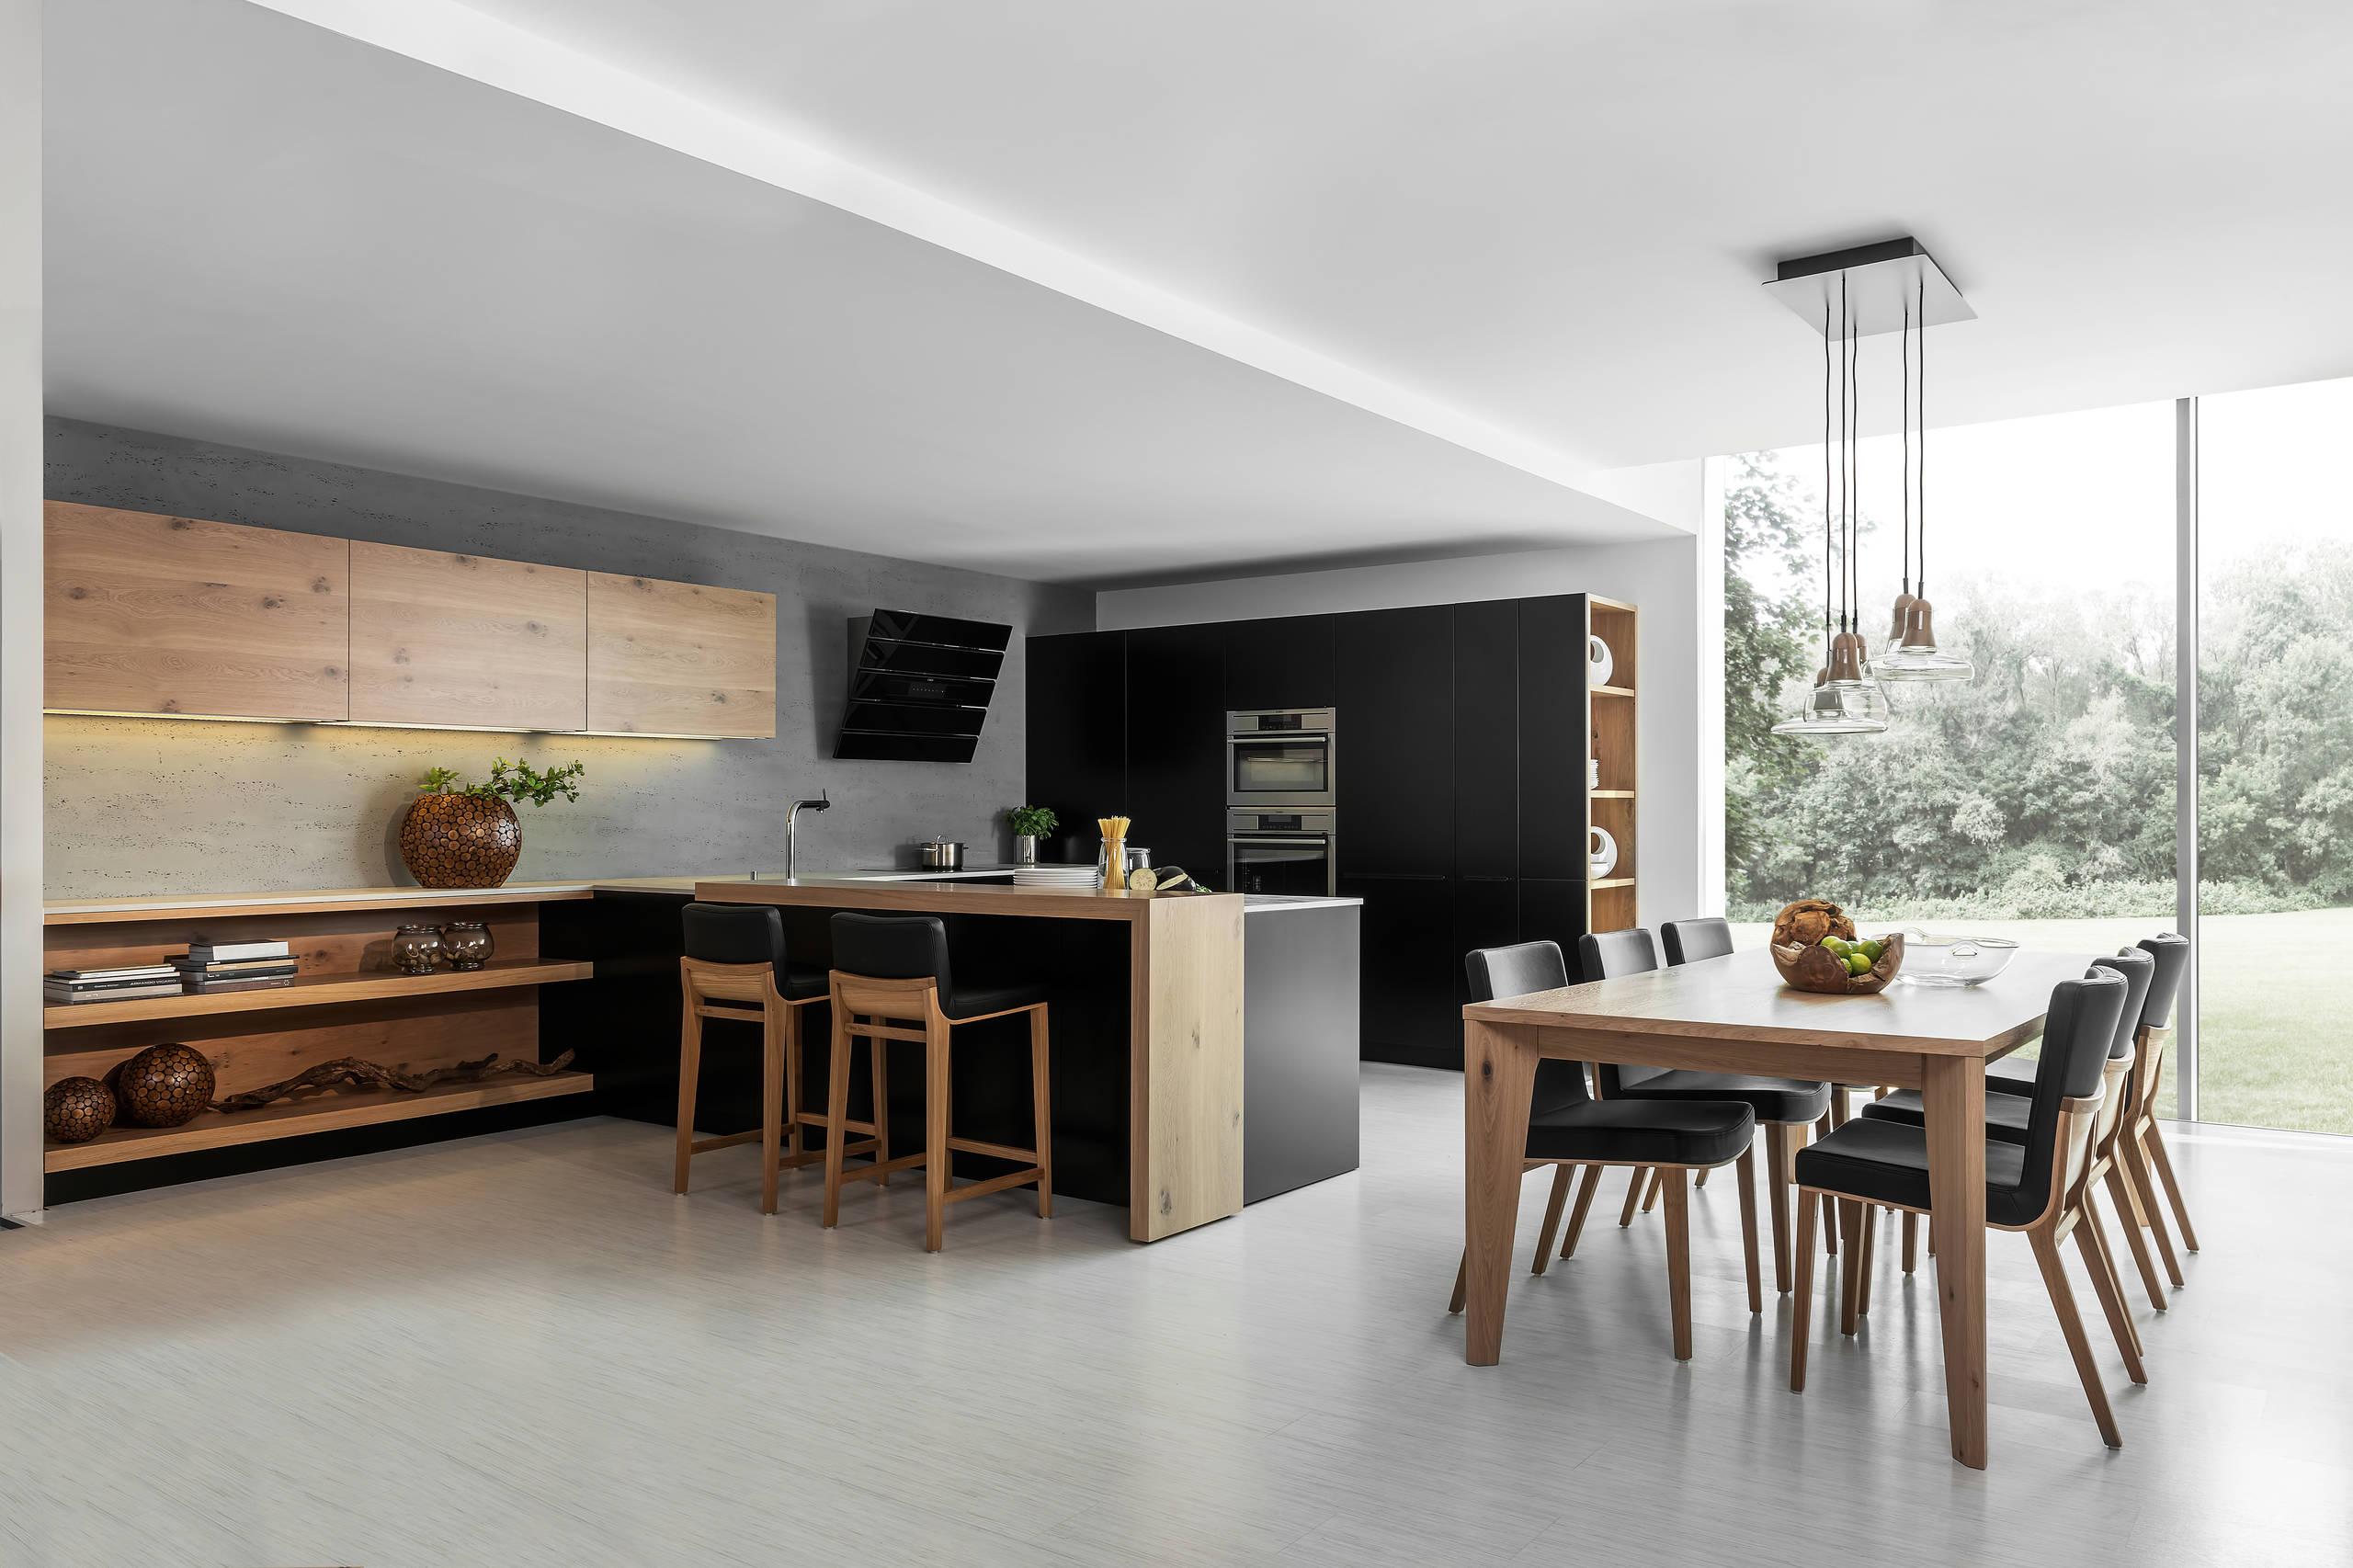 luxury kitchen dining